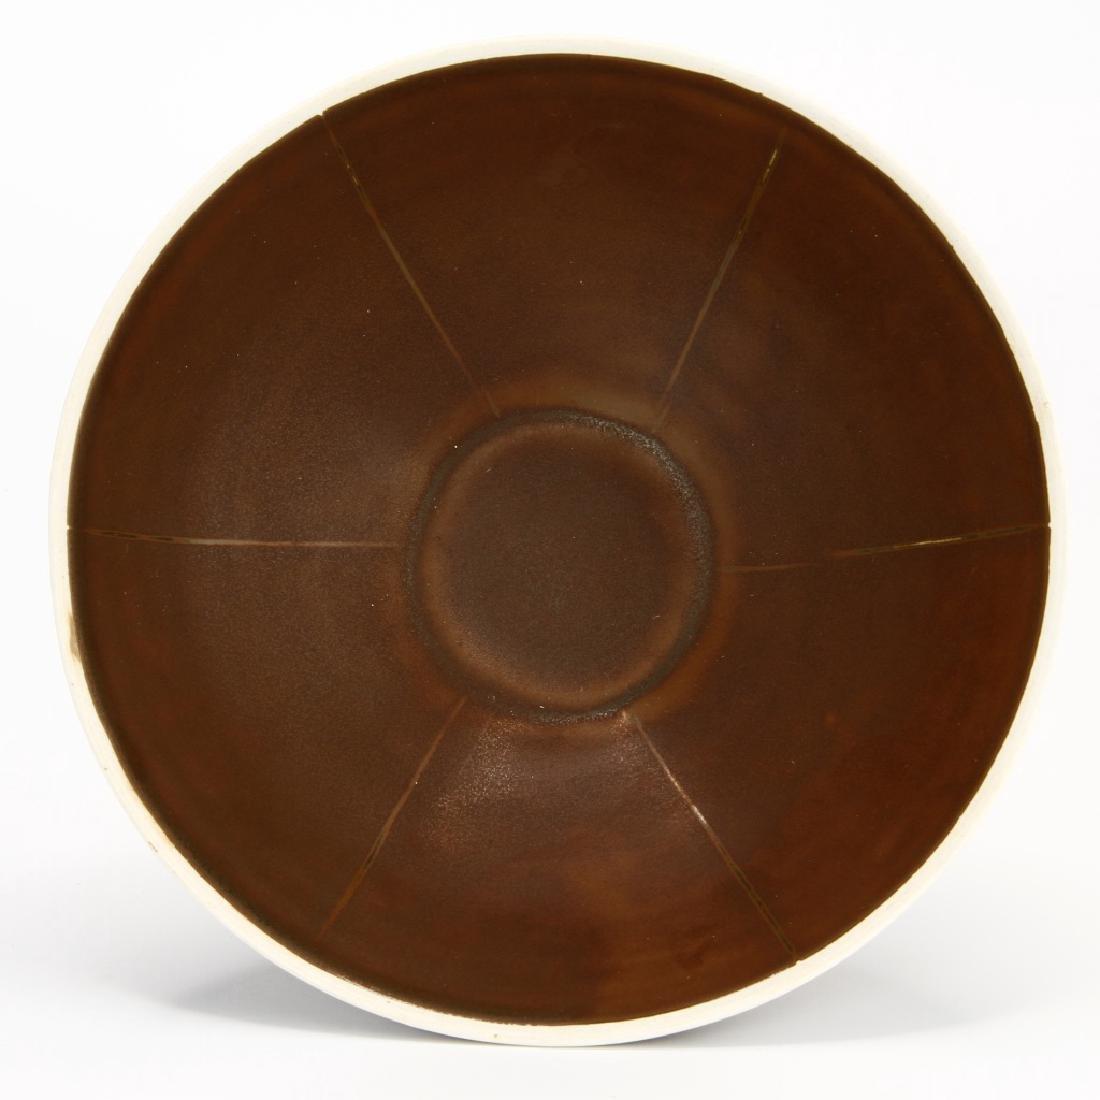 Ting Persimmon Glazed Petal Bowl - 3